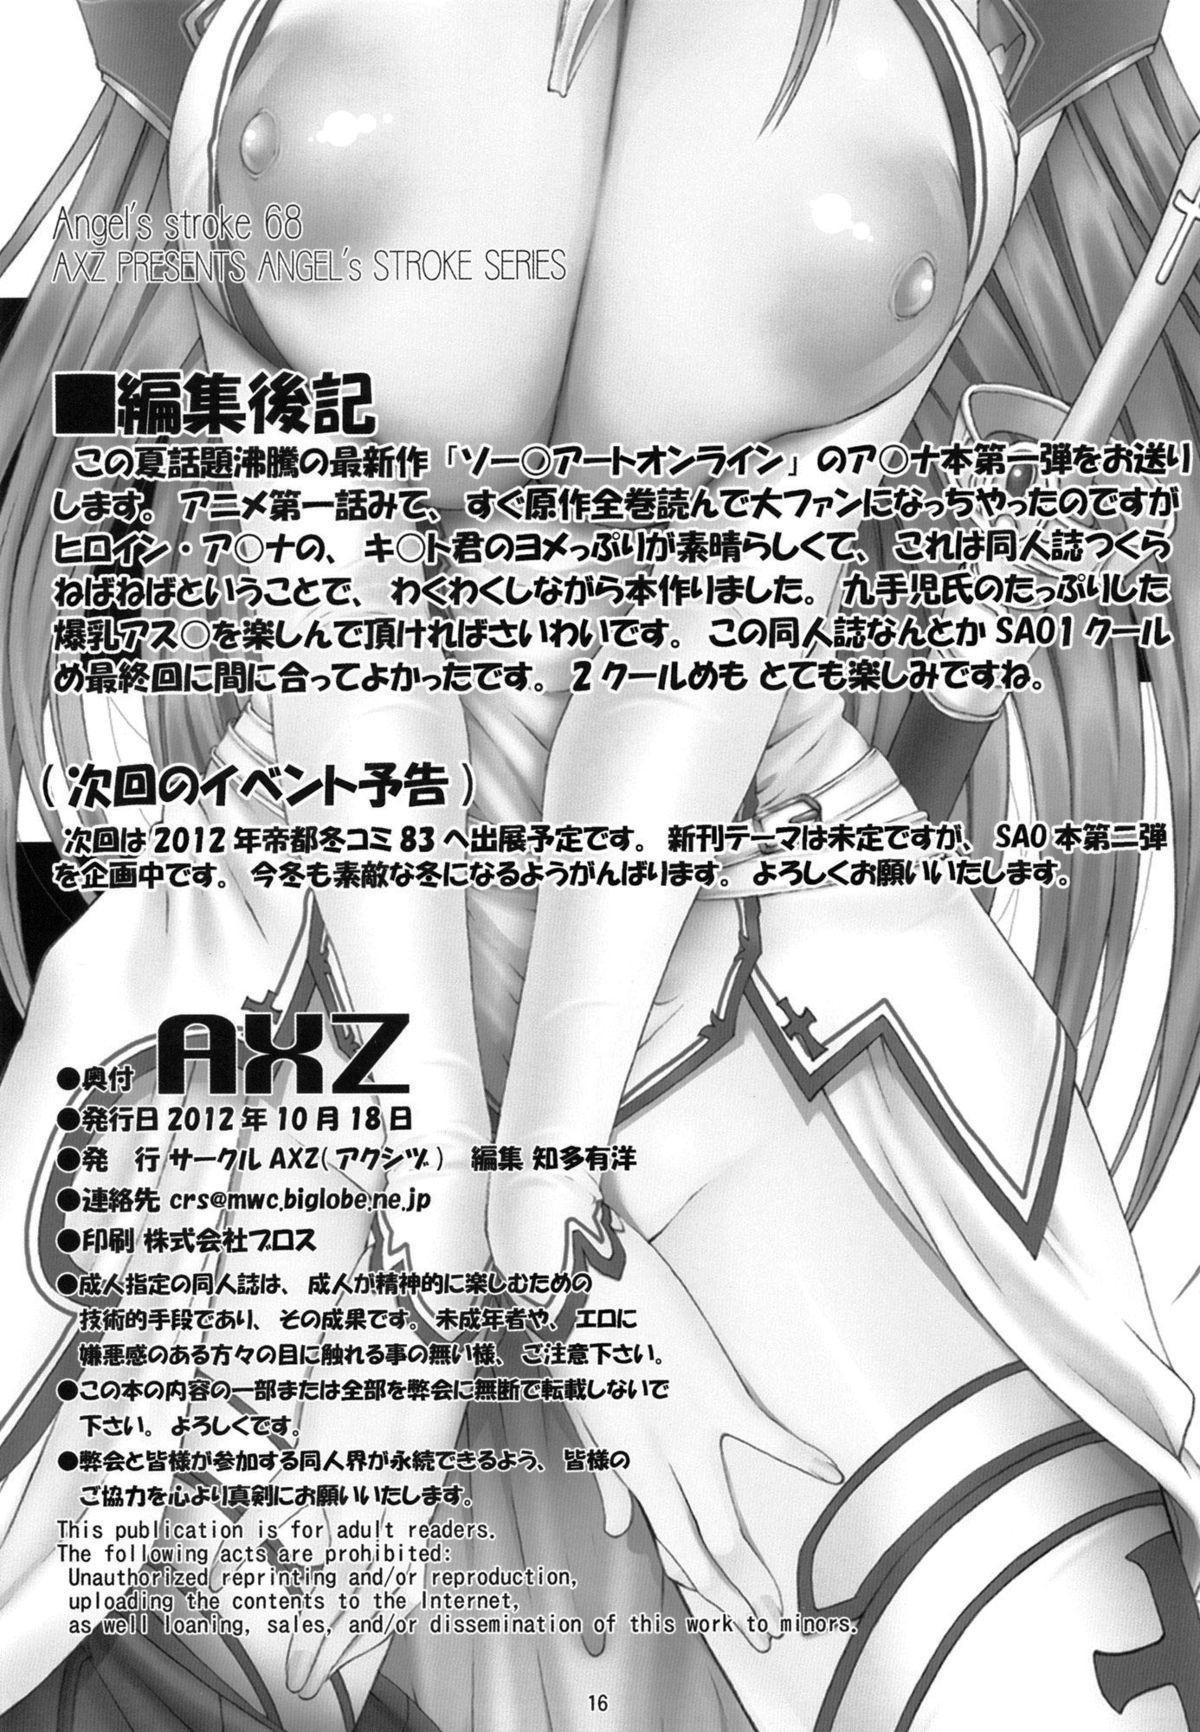 [AXZ (Kutani)] Angel's stroke 68 Asuna Inline Ryoujoku-hen    Angel's Stroke 68 - Asuna Gang-Rpe Chapter (Sword Art Online) [English] {doujin-moe.us} 16